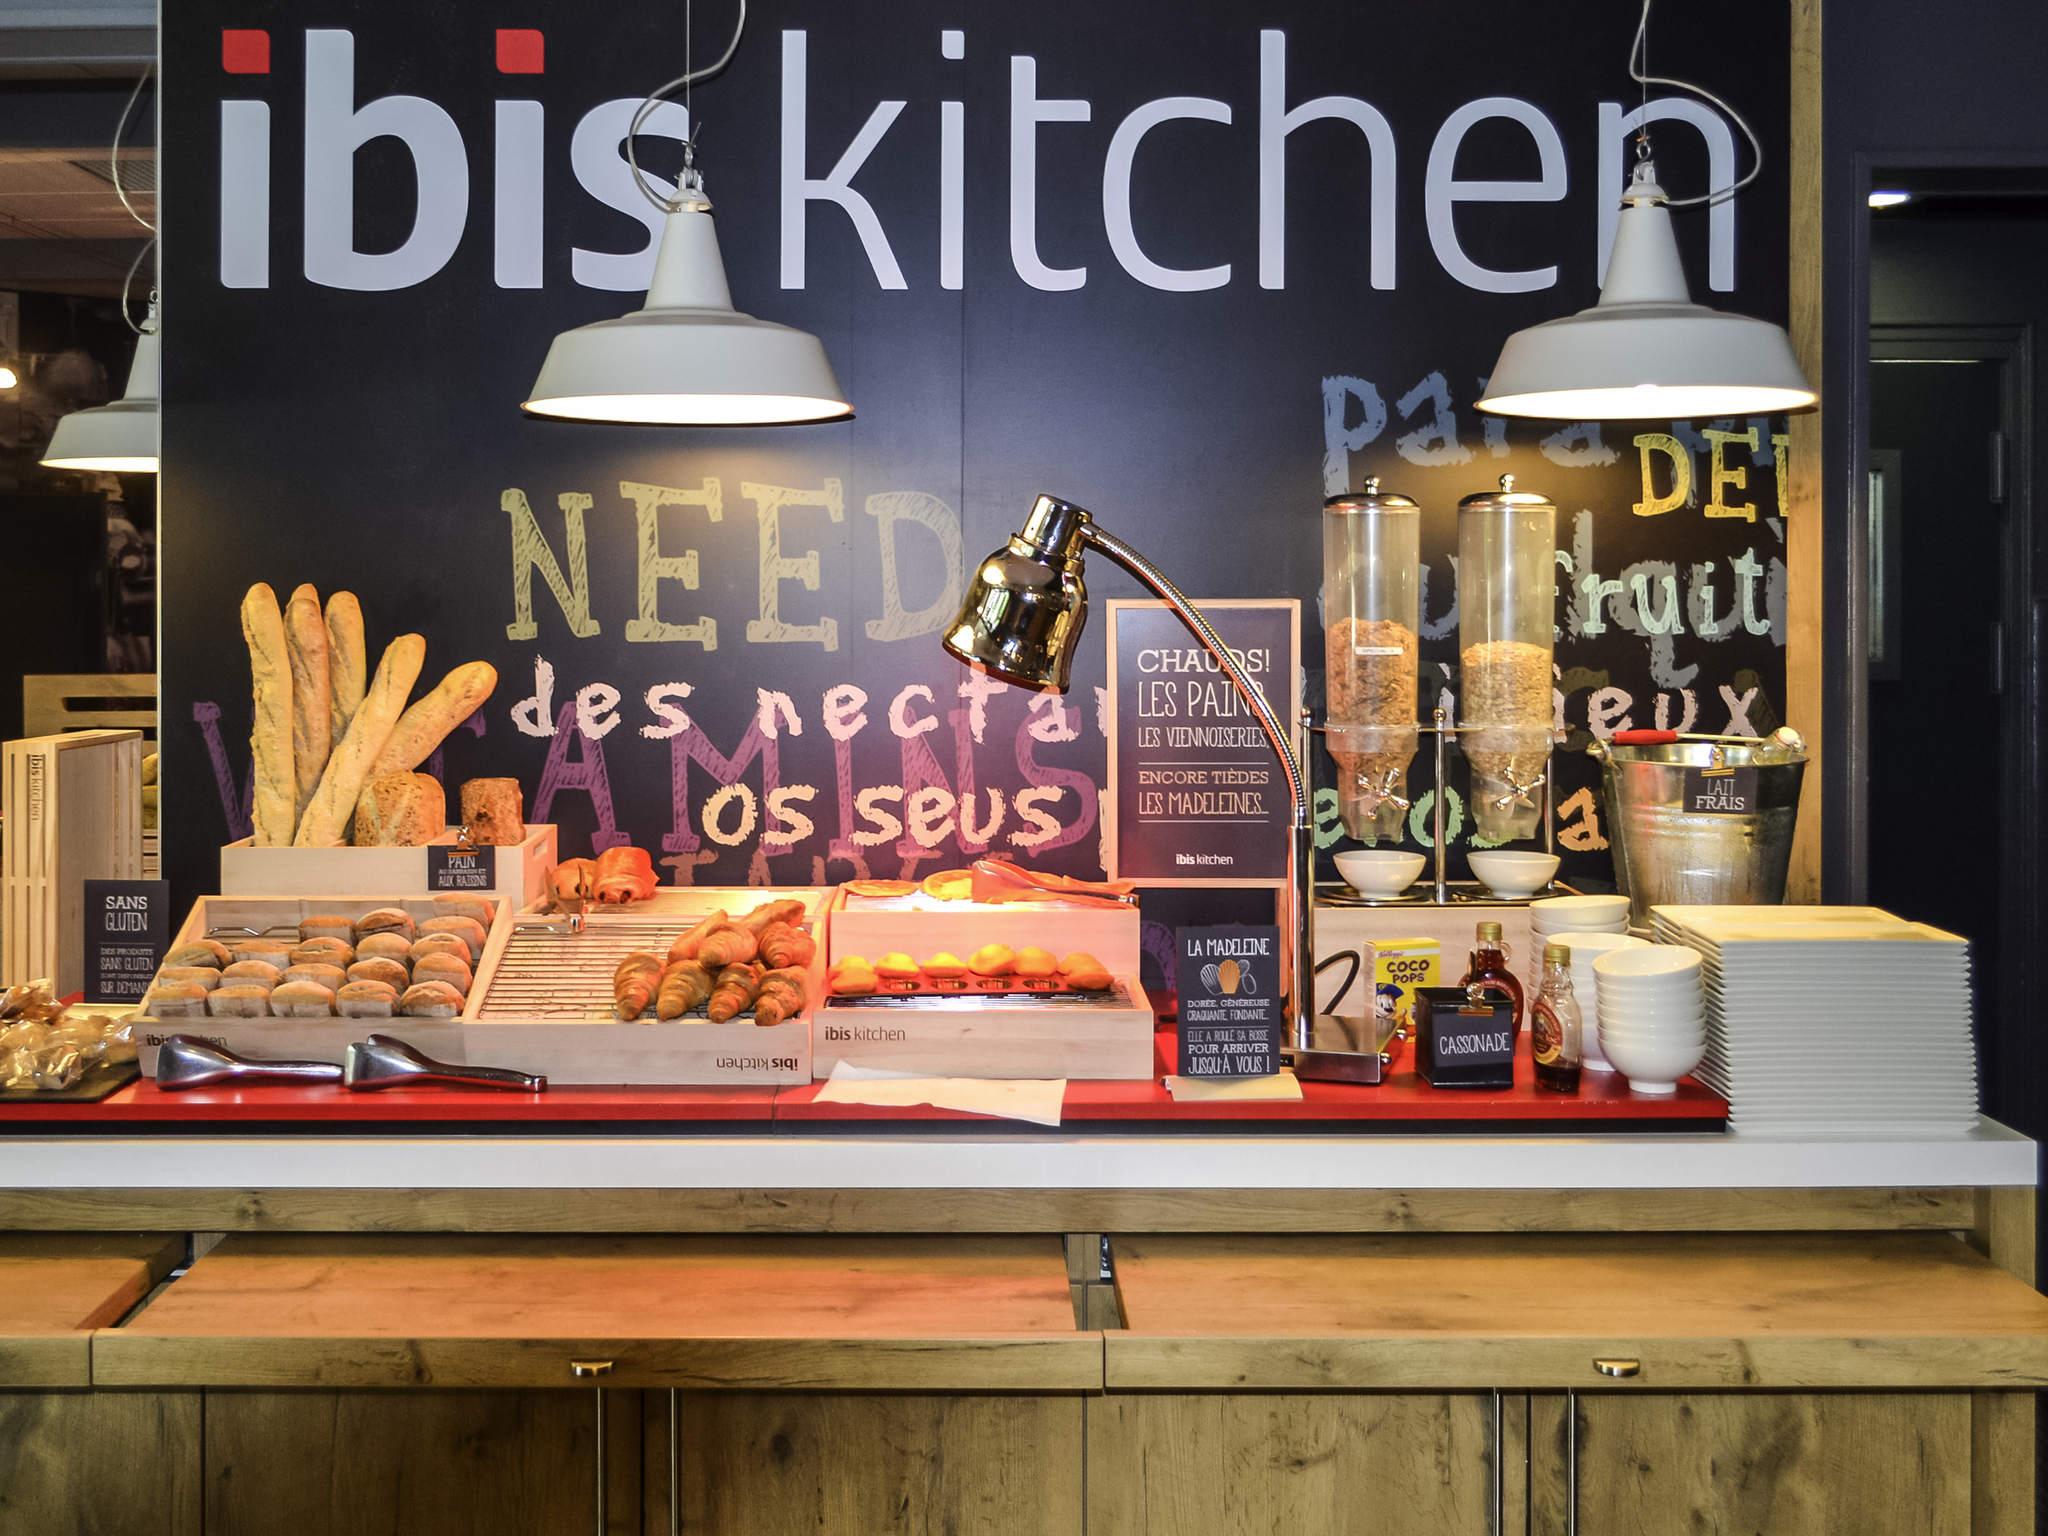 Hotel in salon de provence ibis salon de provence south for Ibis hotel salon de provence